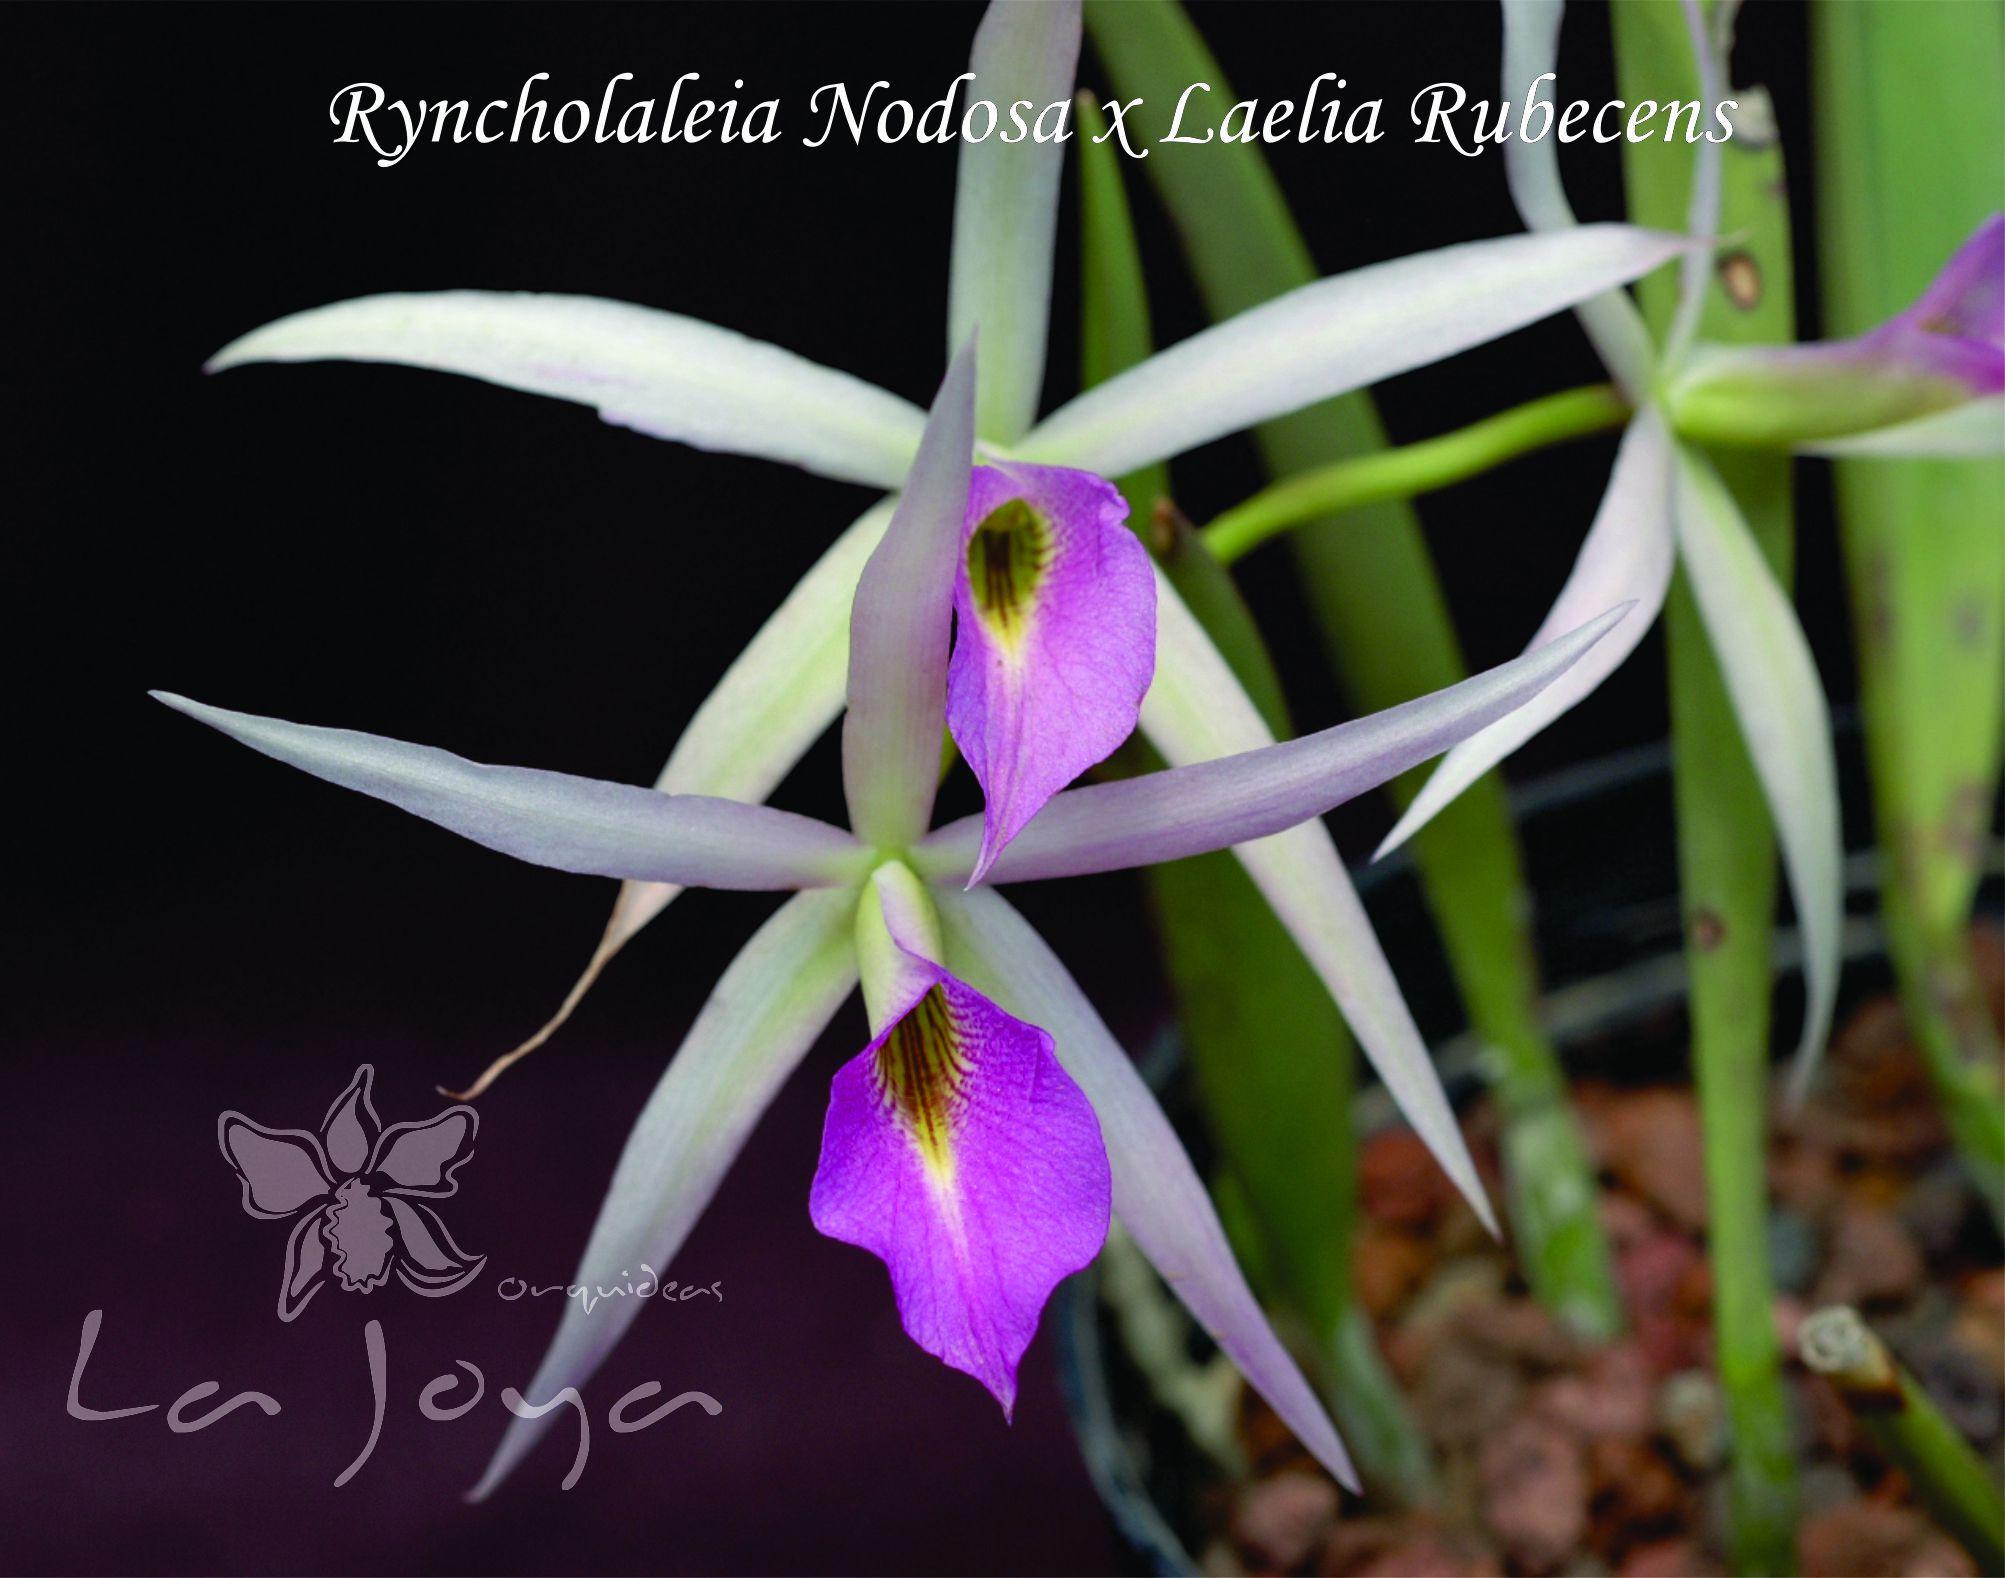 Ryncholaelia Nodosa x Laelia Rubescens